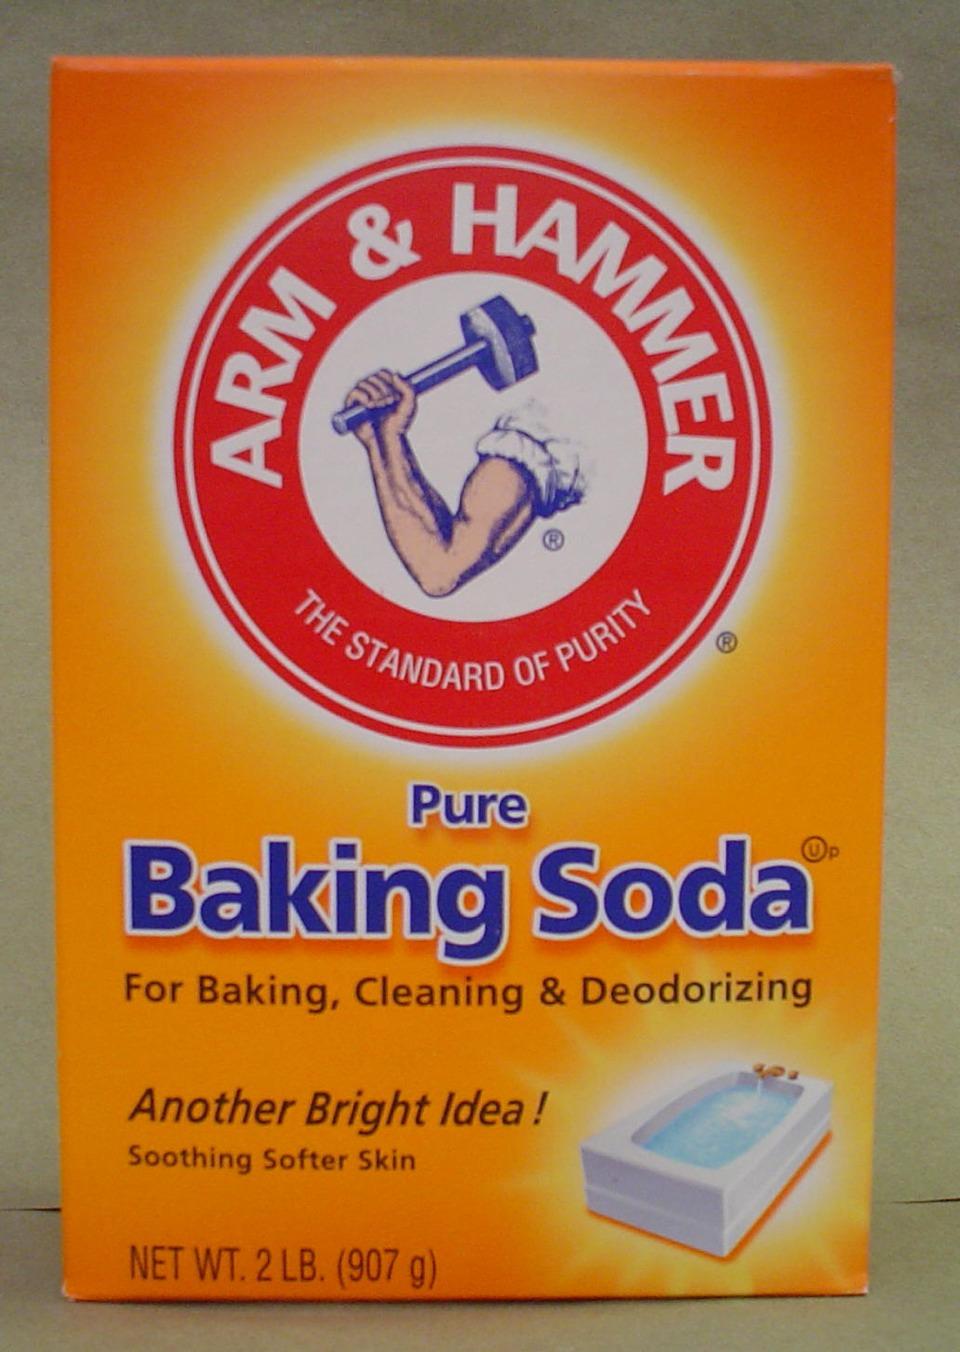 And baking soda.